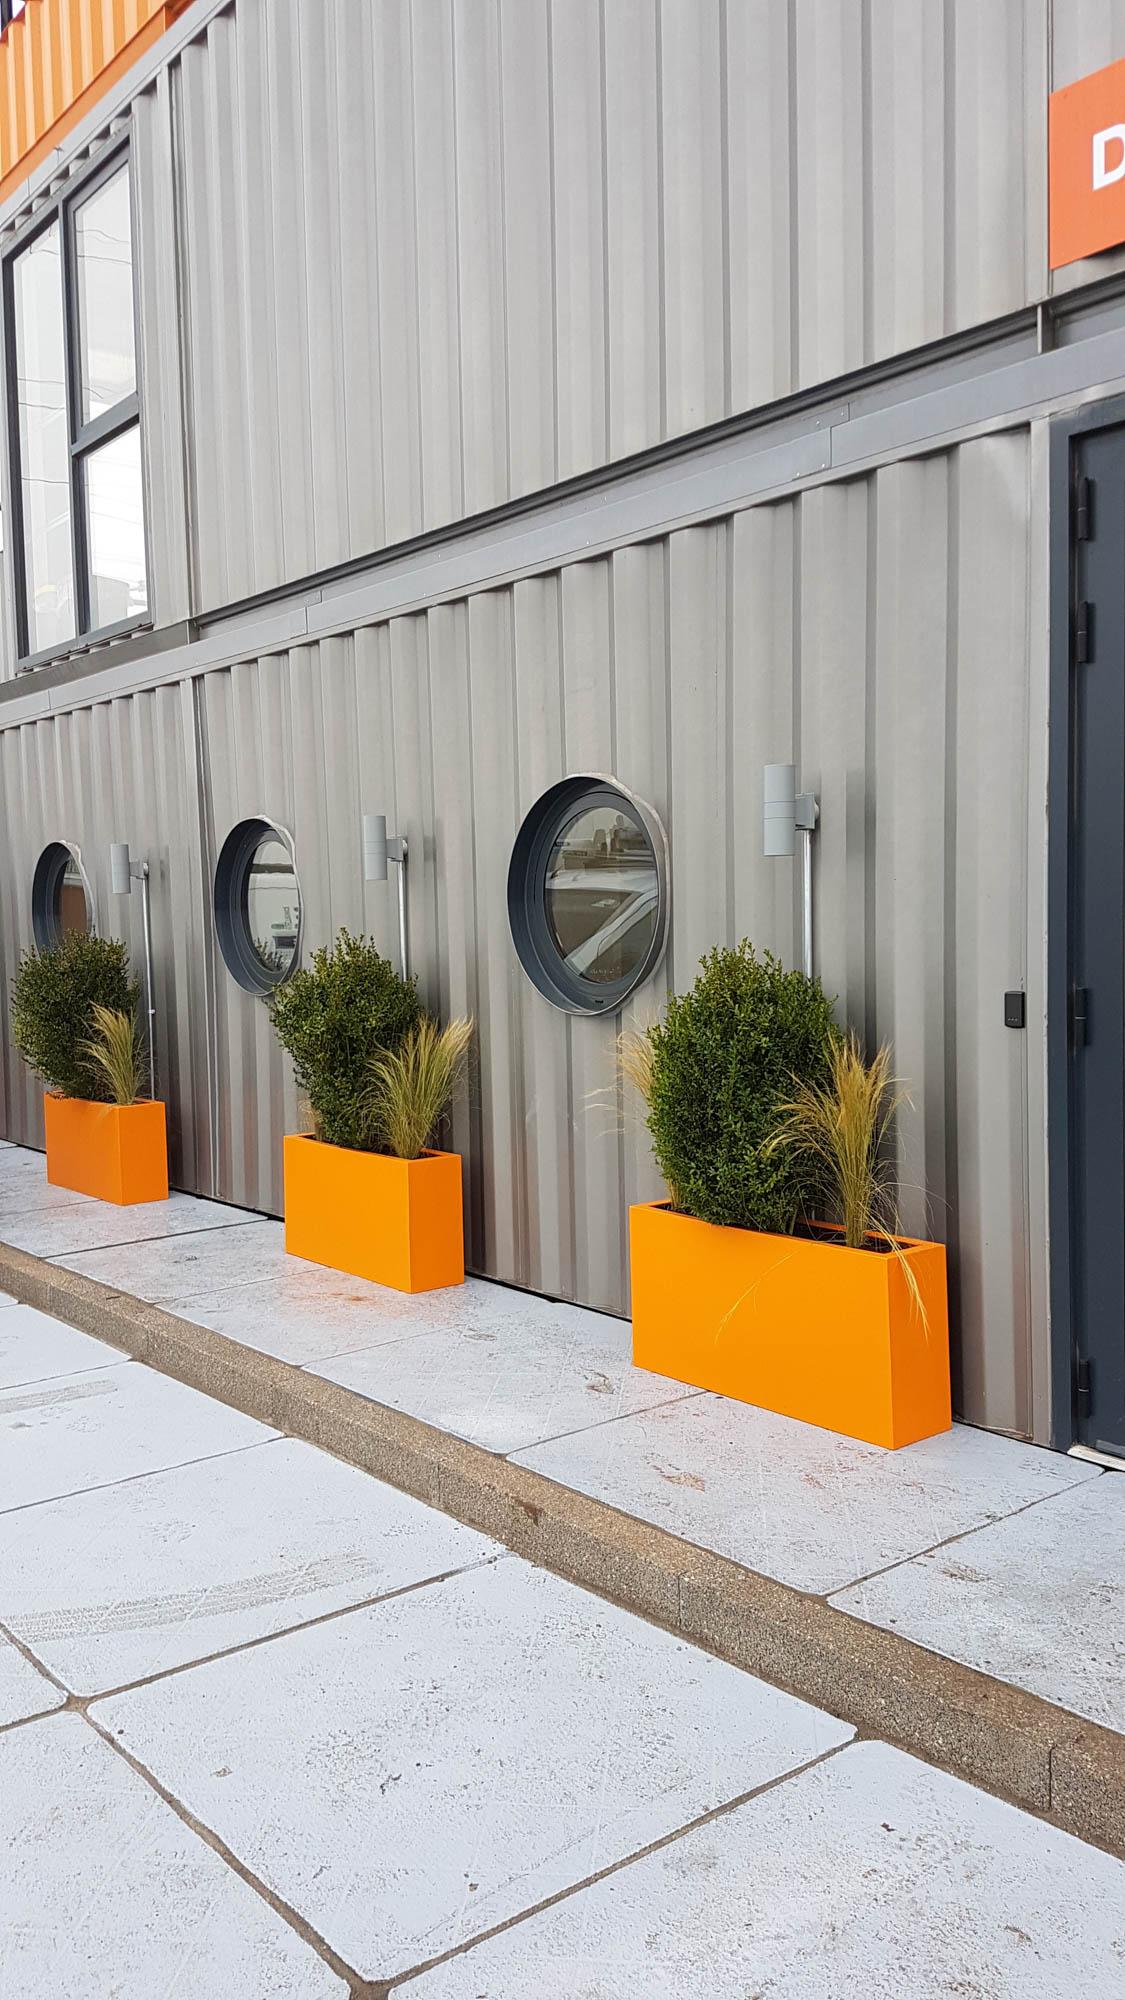 bristol-and-avon-interior-plants-planters-custom-bespoke-branded-construction-plantcare-image-3